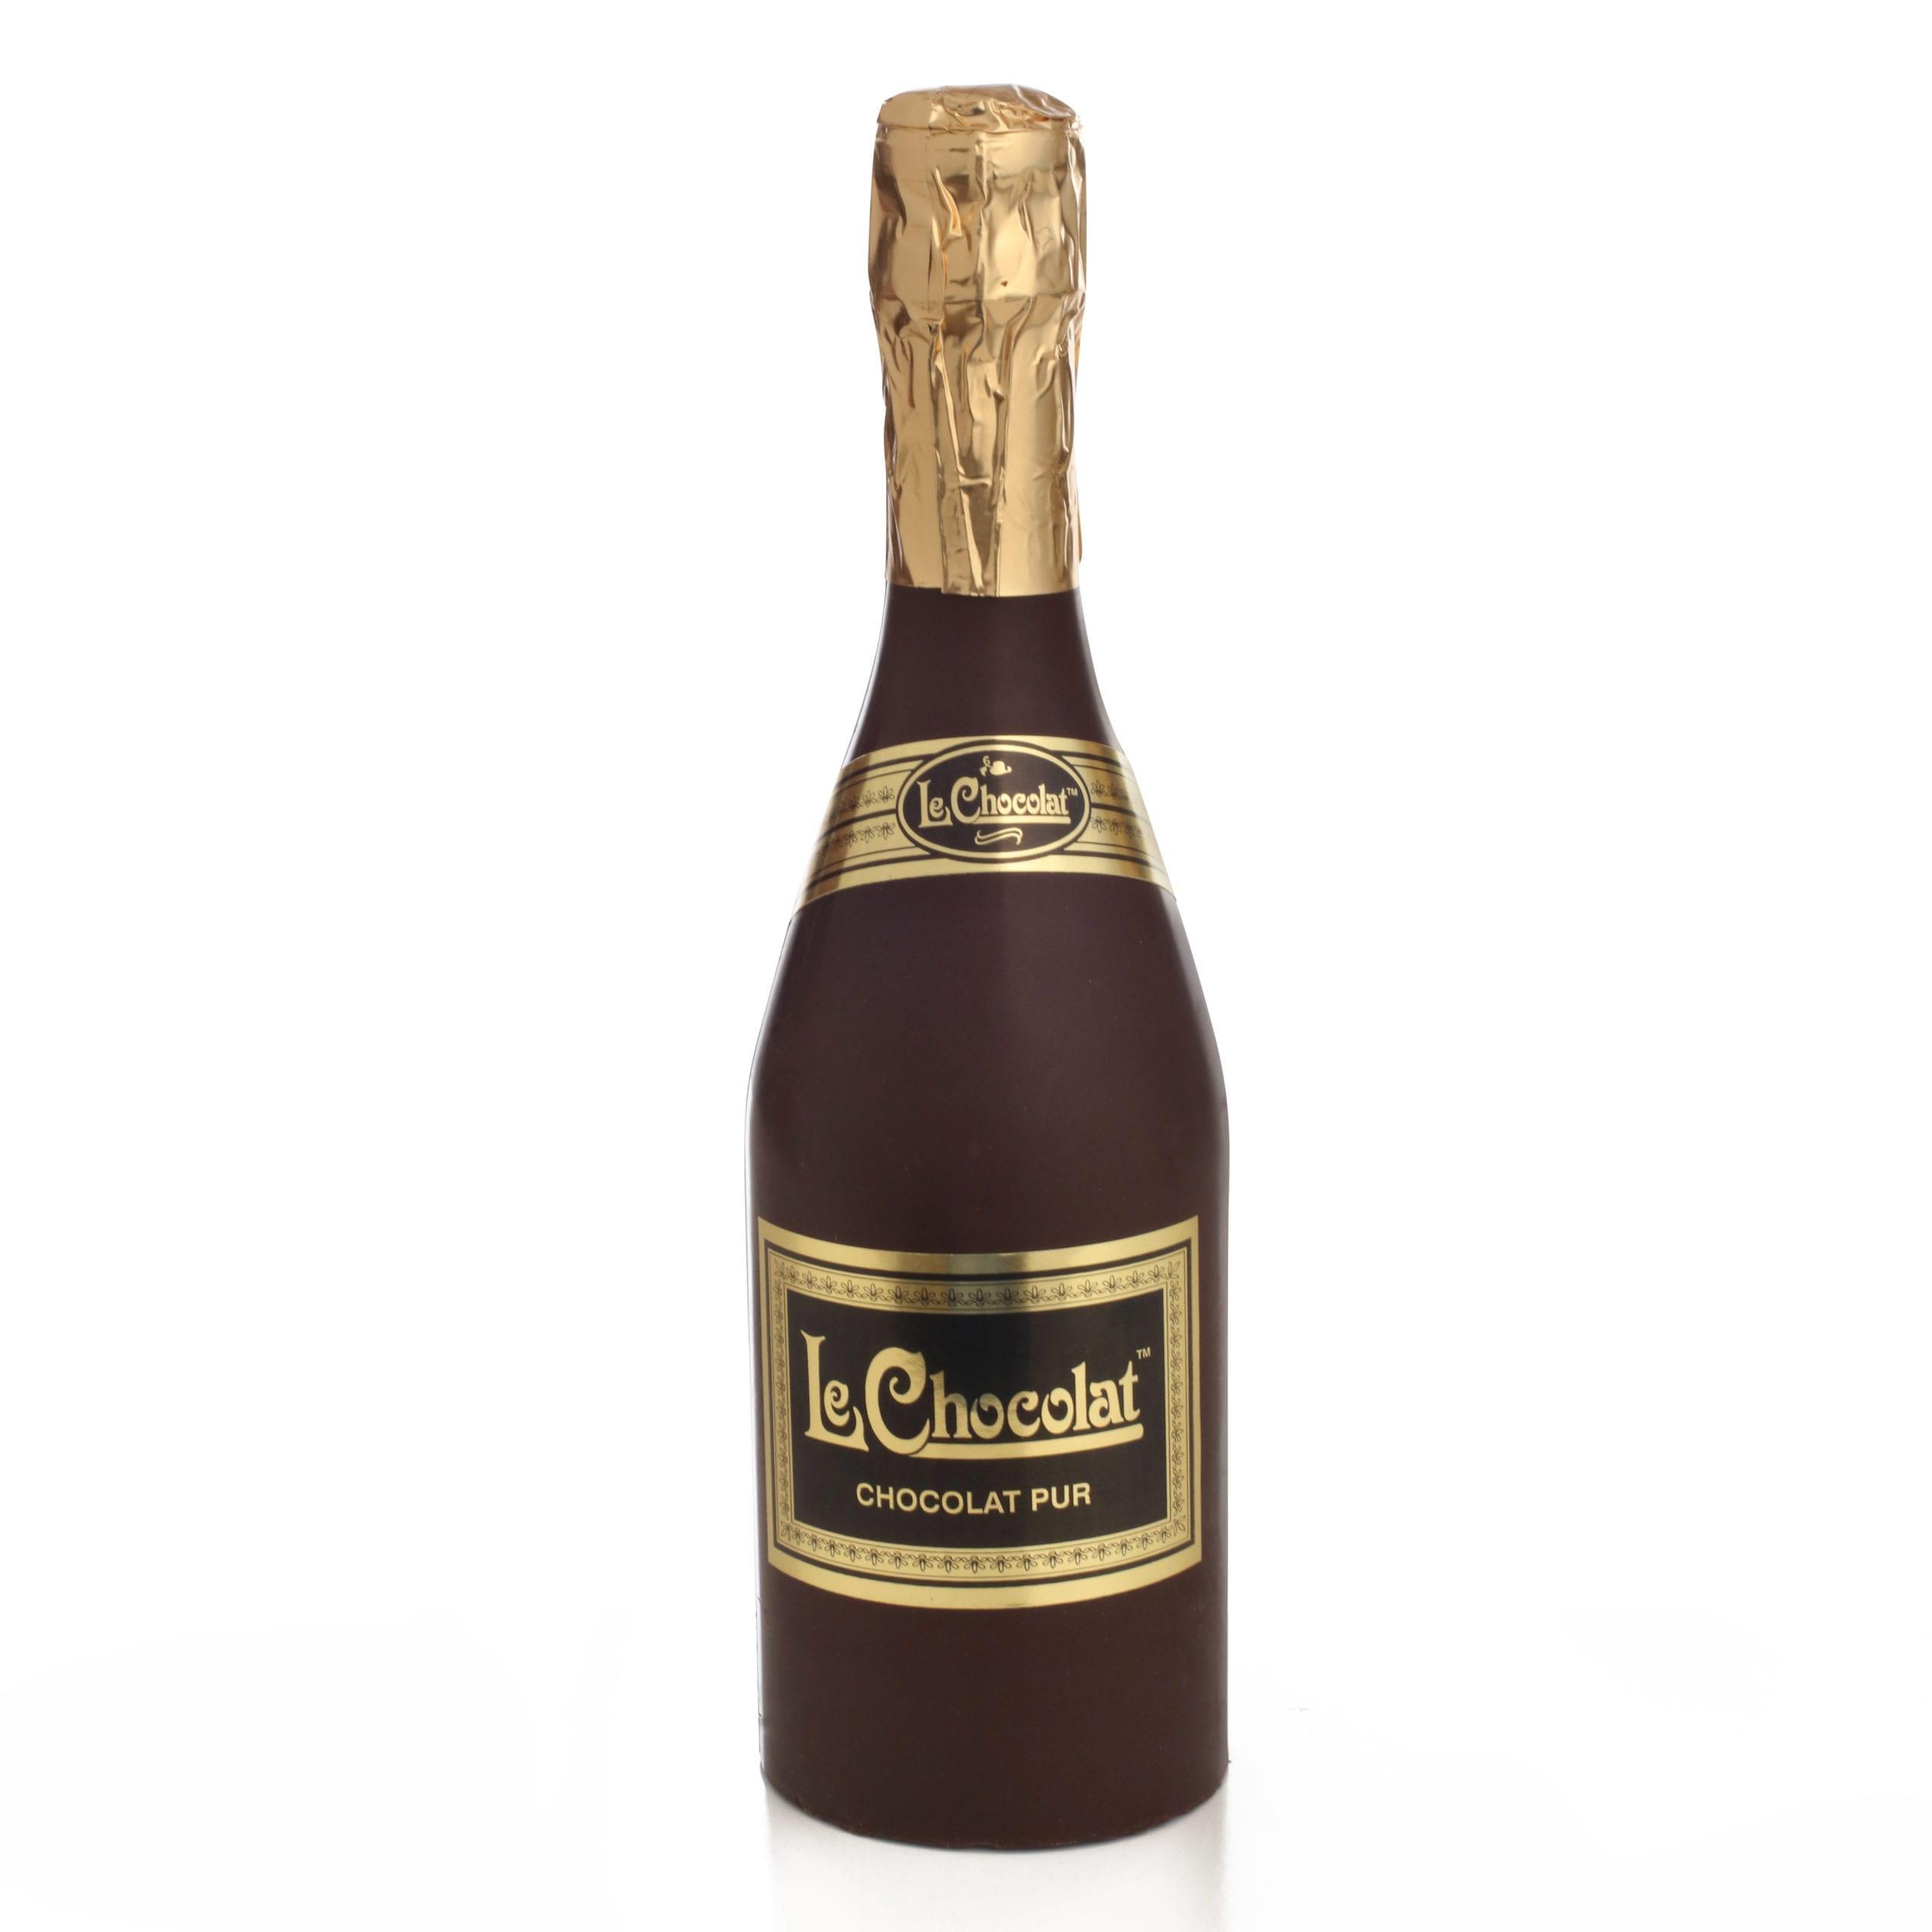 Belgina Chocolate Wine Bottle (dairy) | The Chocolate Bar